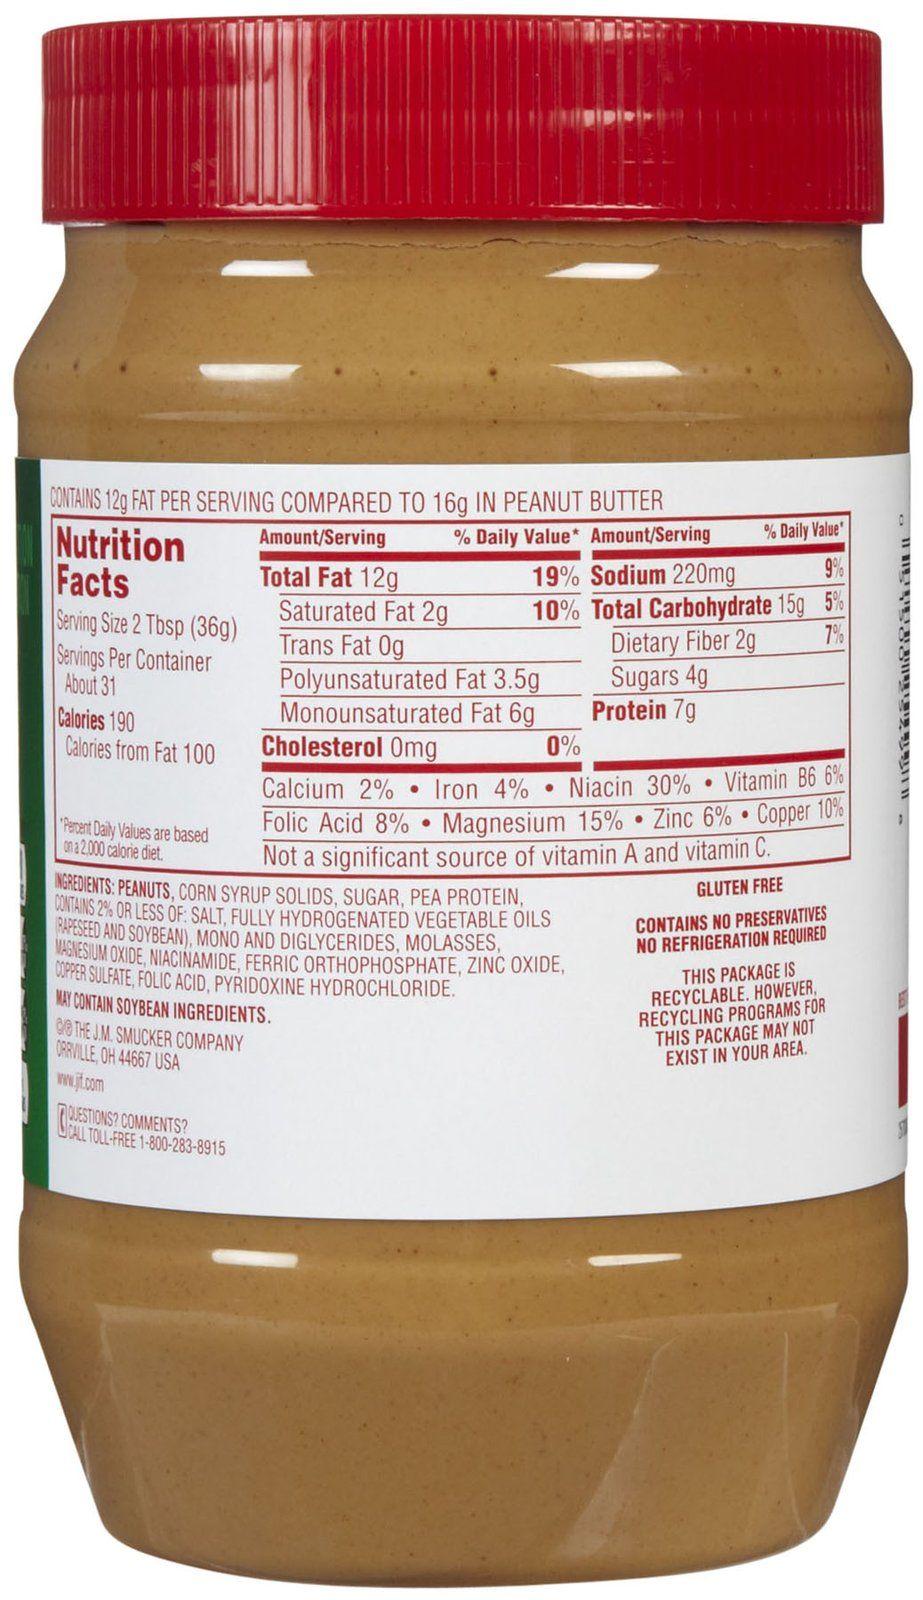 Reduced Fat Jif Peanut Butter Nutrition Facts Salegoods